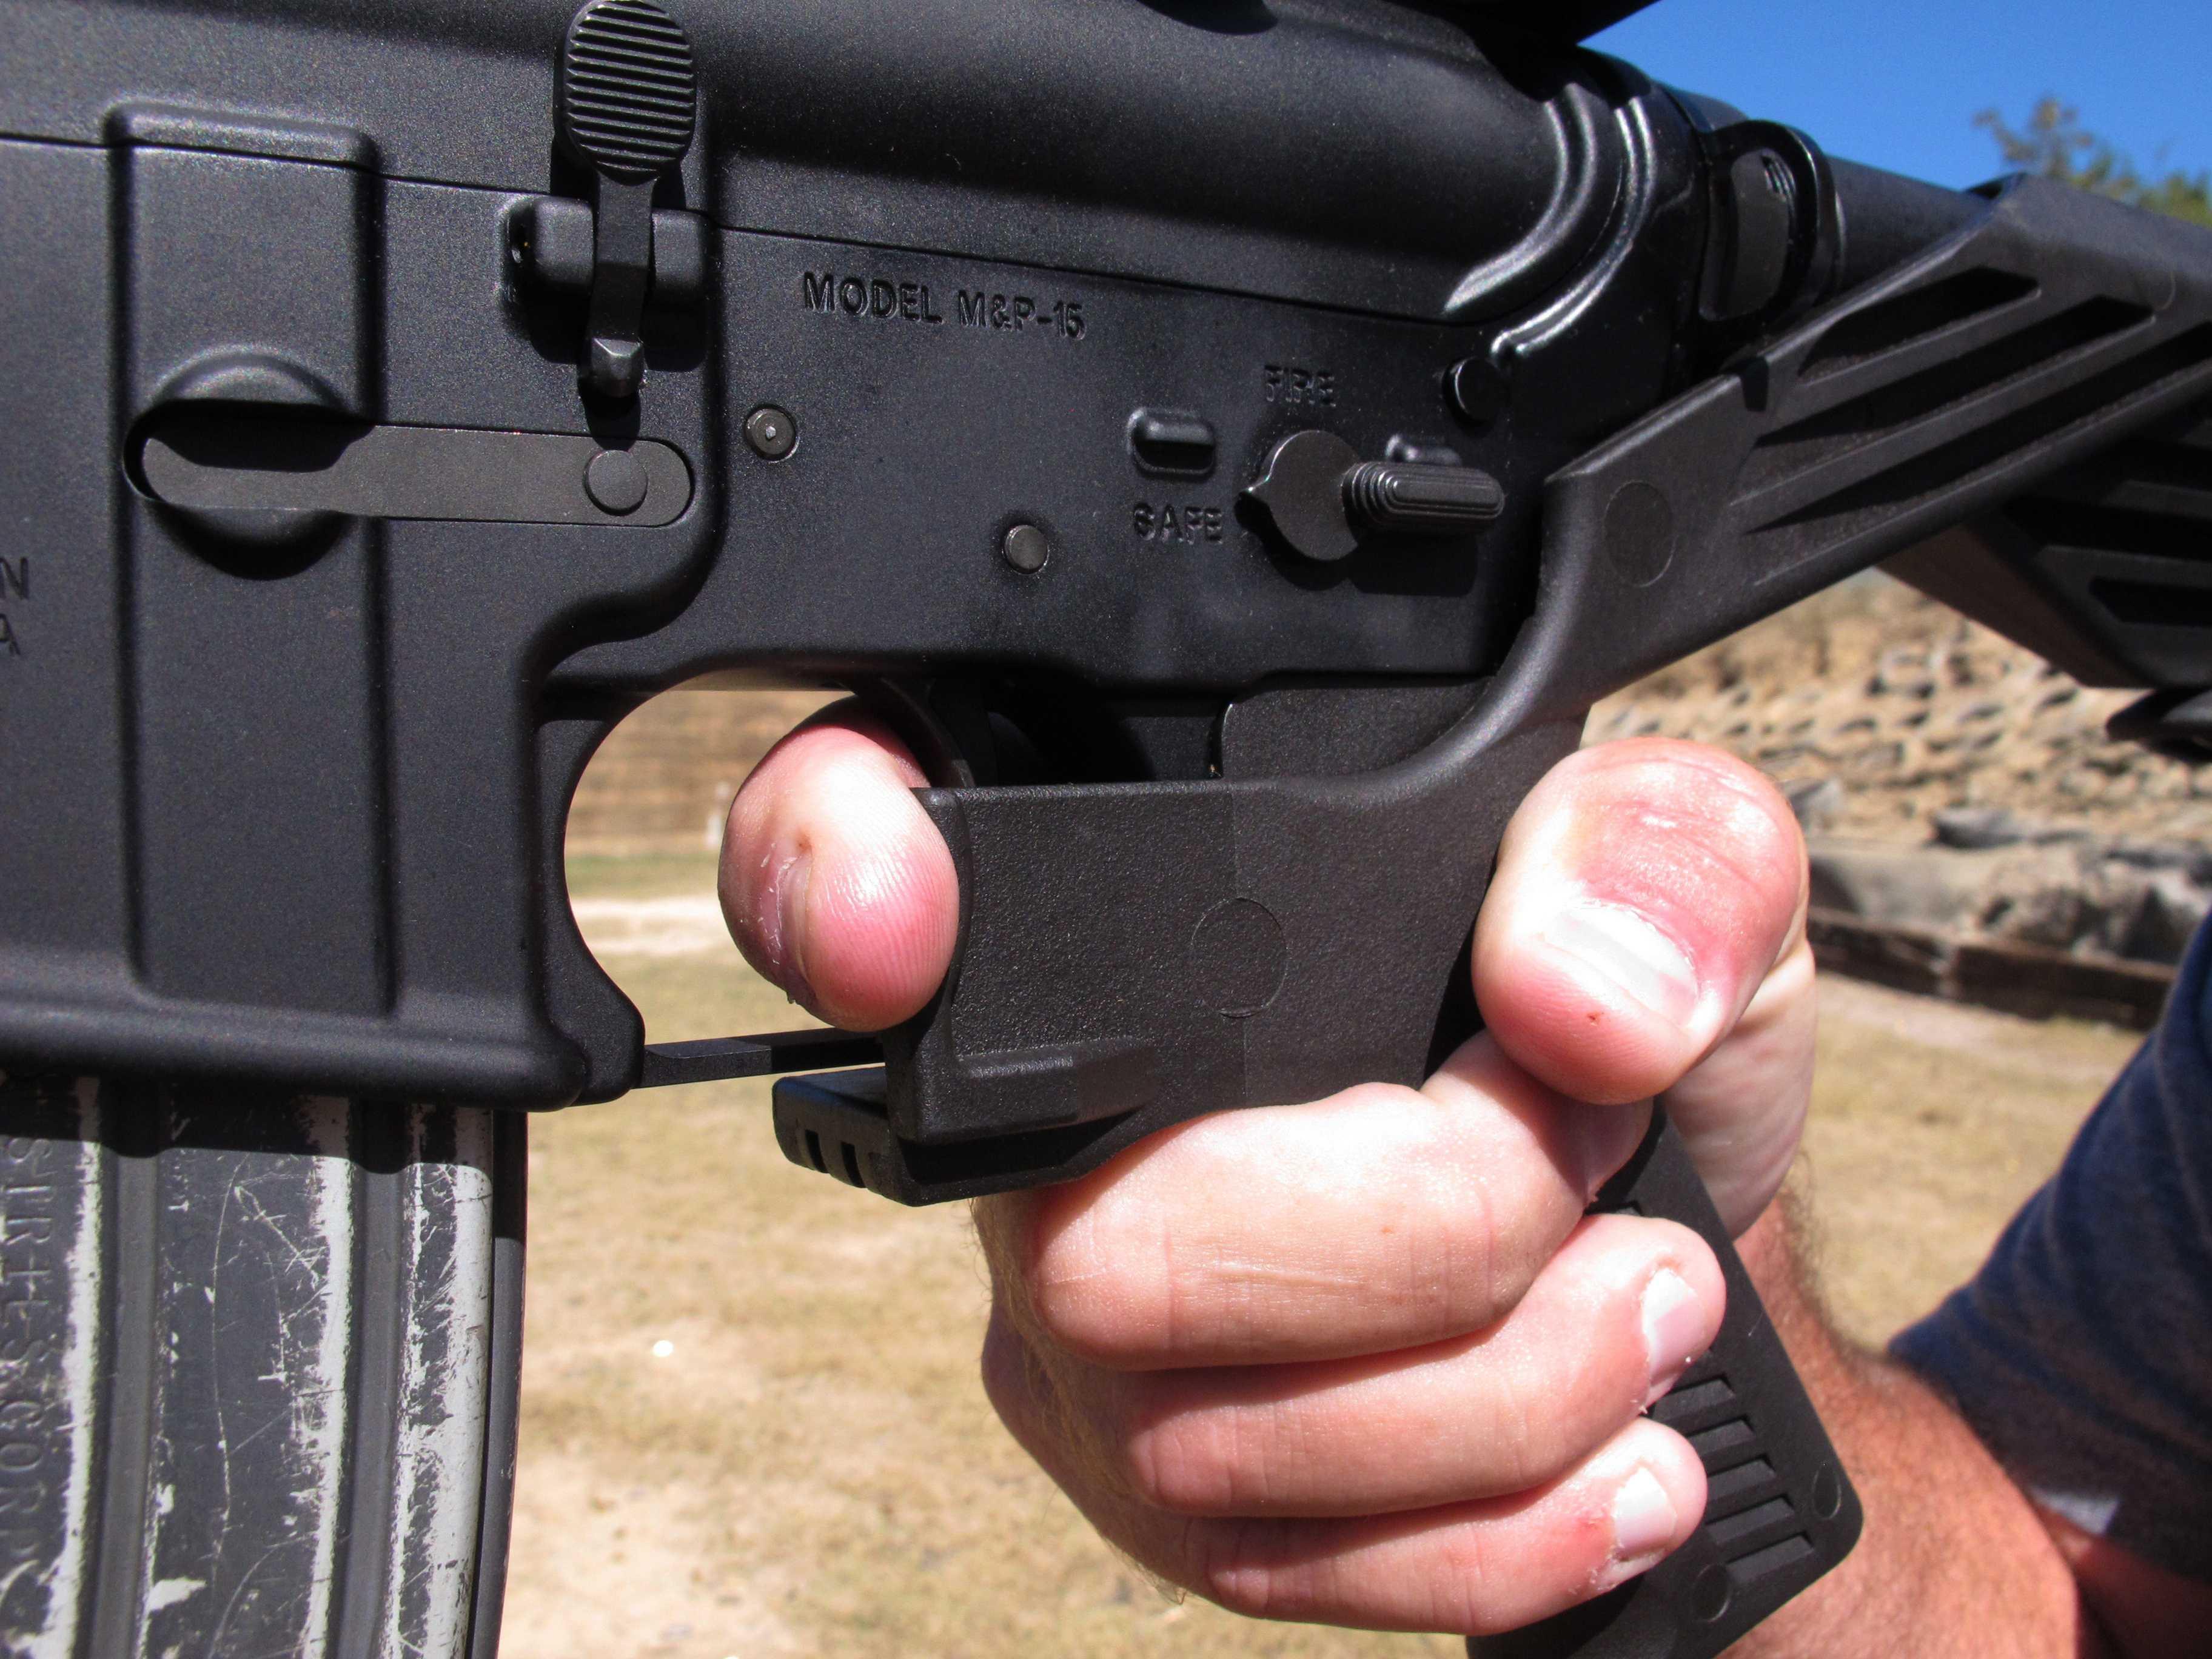 Gun-Control Group Sues 'Bump Stock' Makers, Sellers